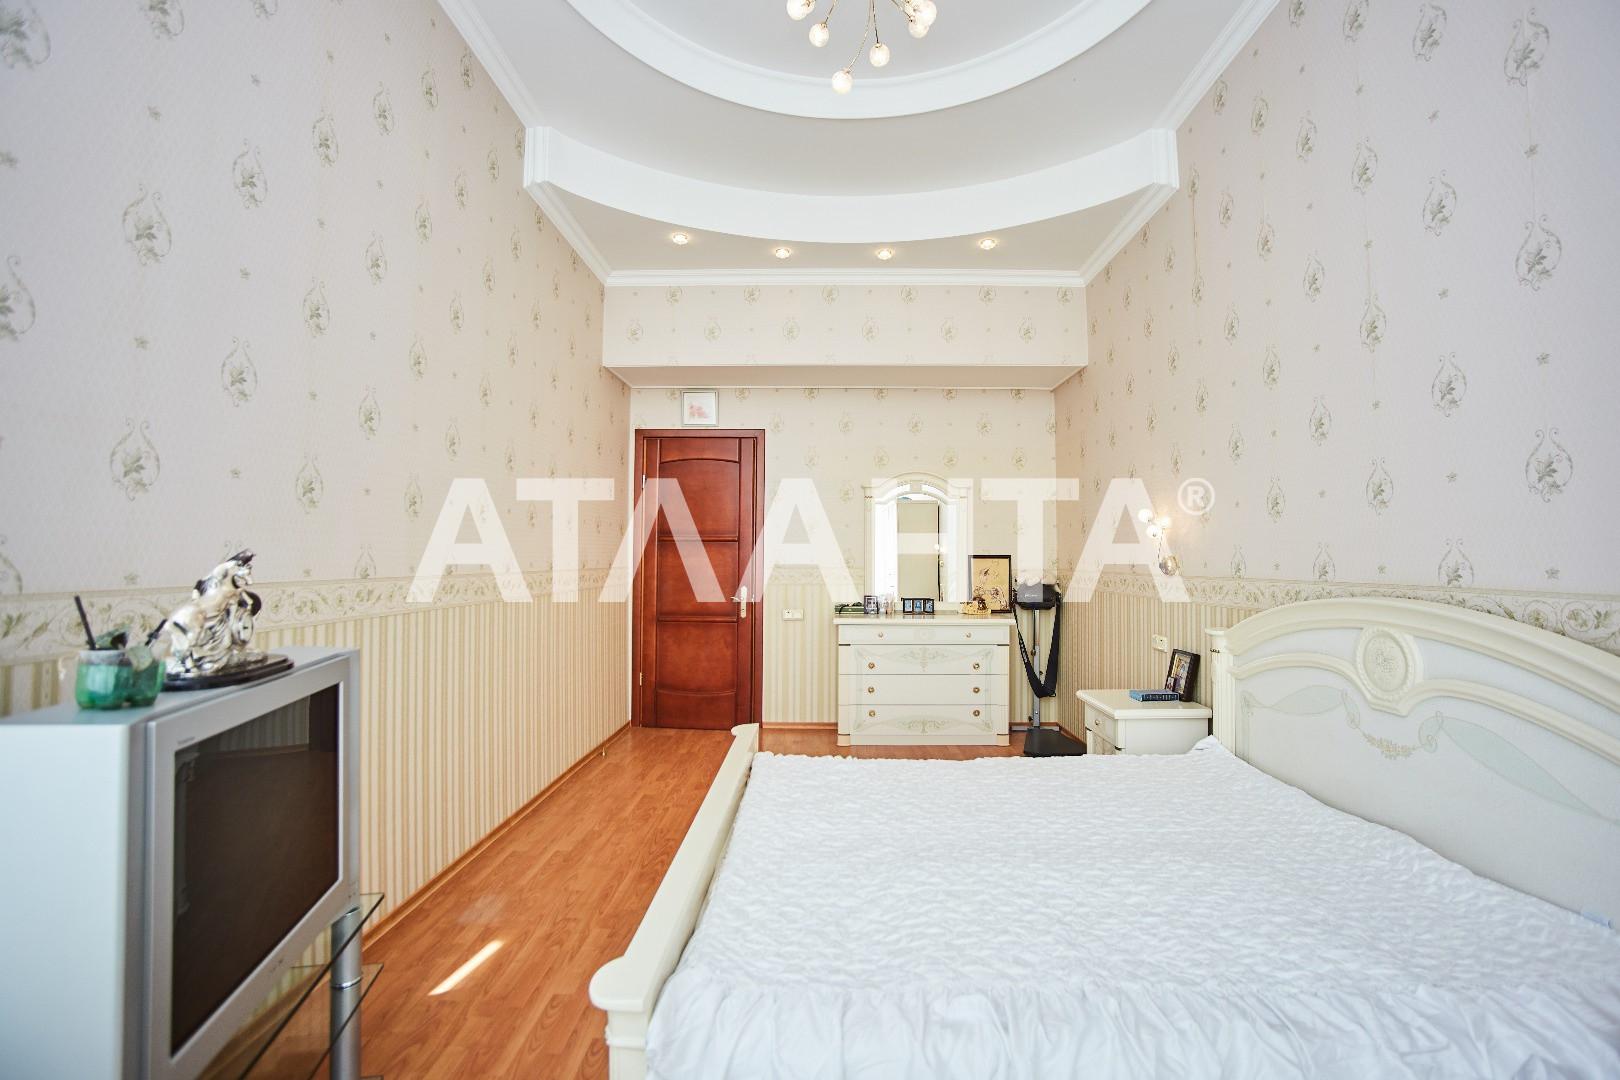 Продается Многоуровневая Квартира на ул. Посмитного — 295 000 у.е. (фото №27)